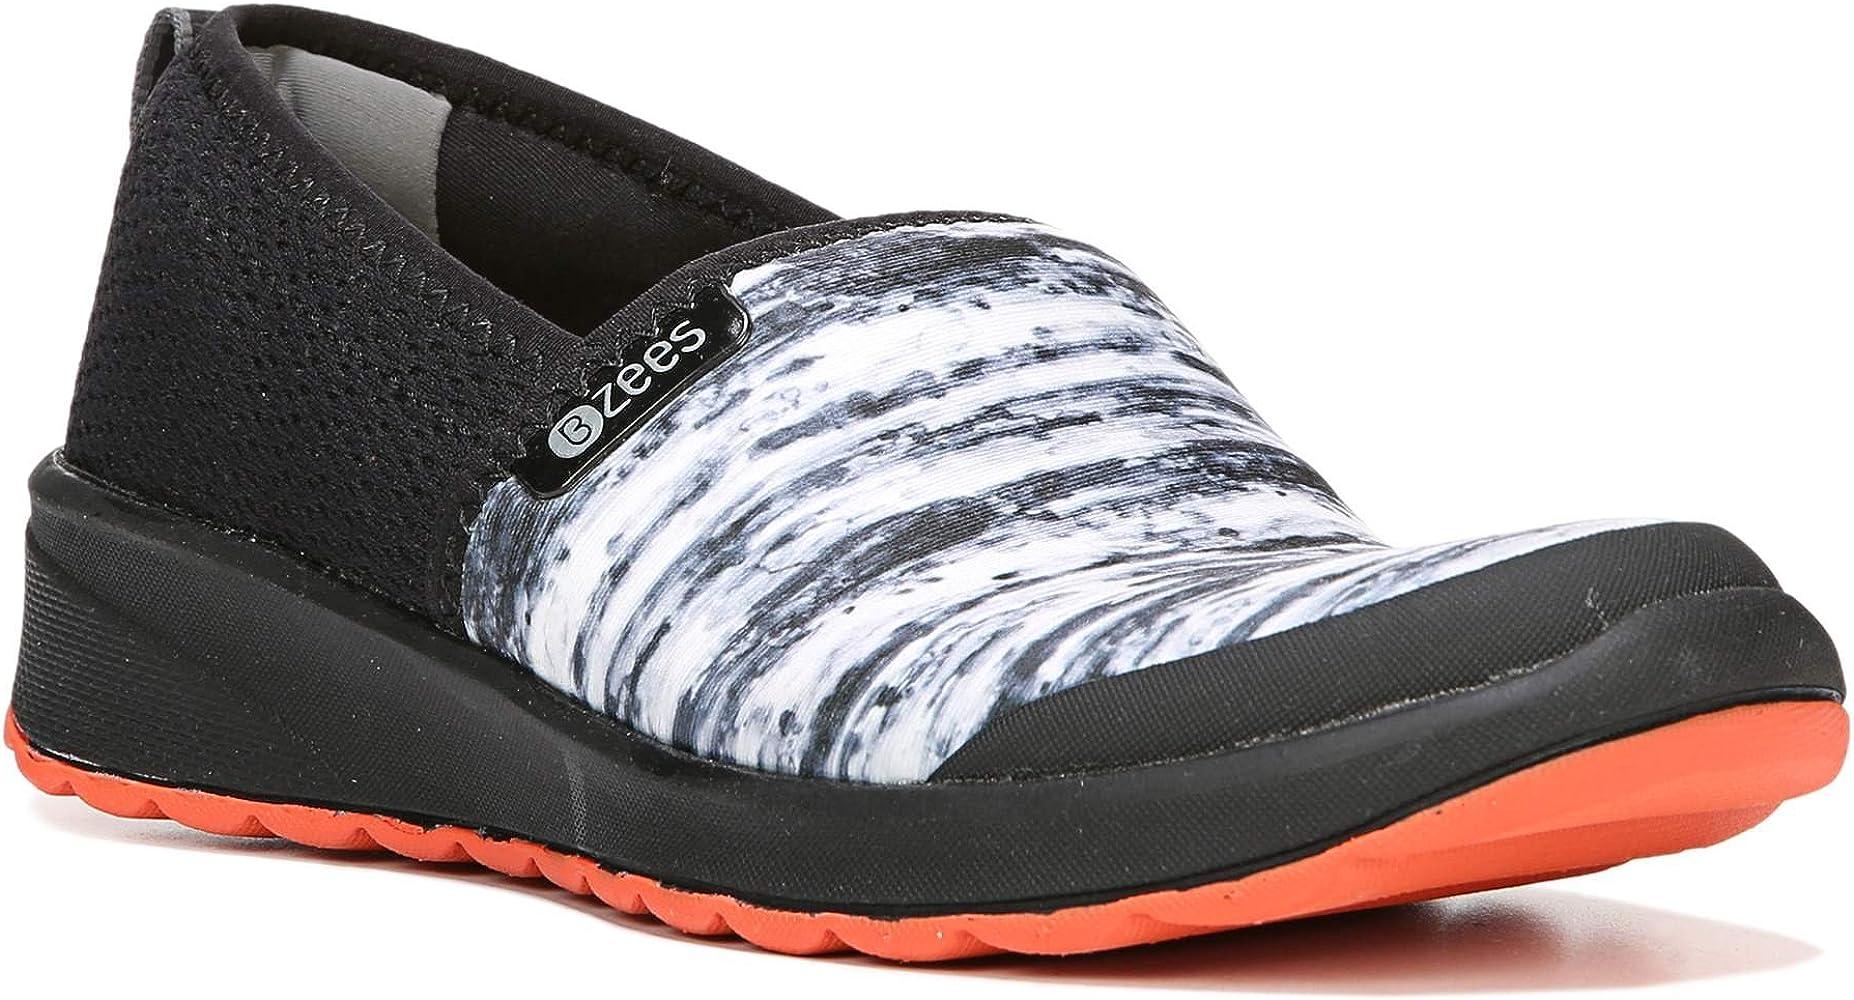 Amazon.com: BZees Glee Slip-ONS: Shoes